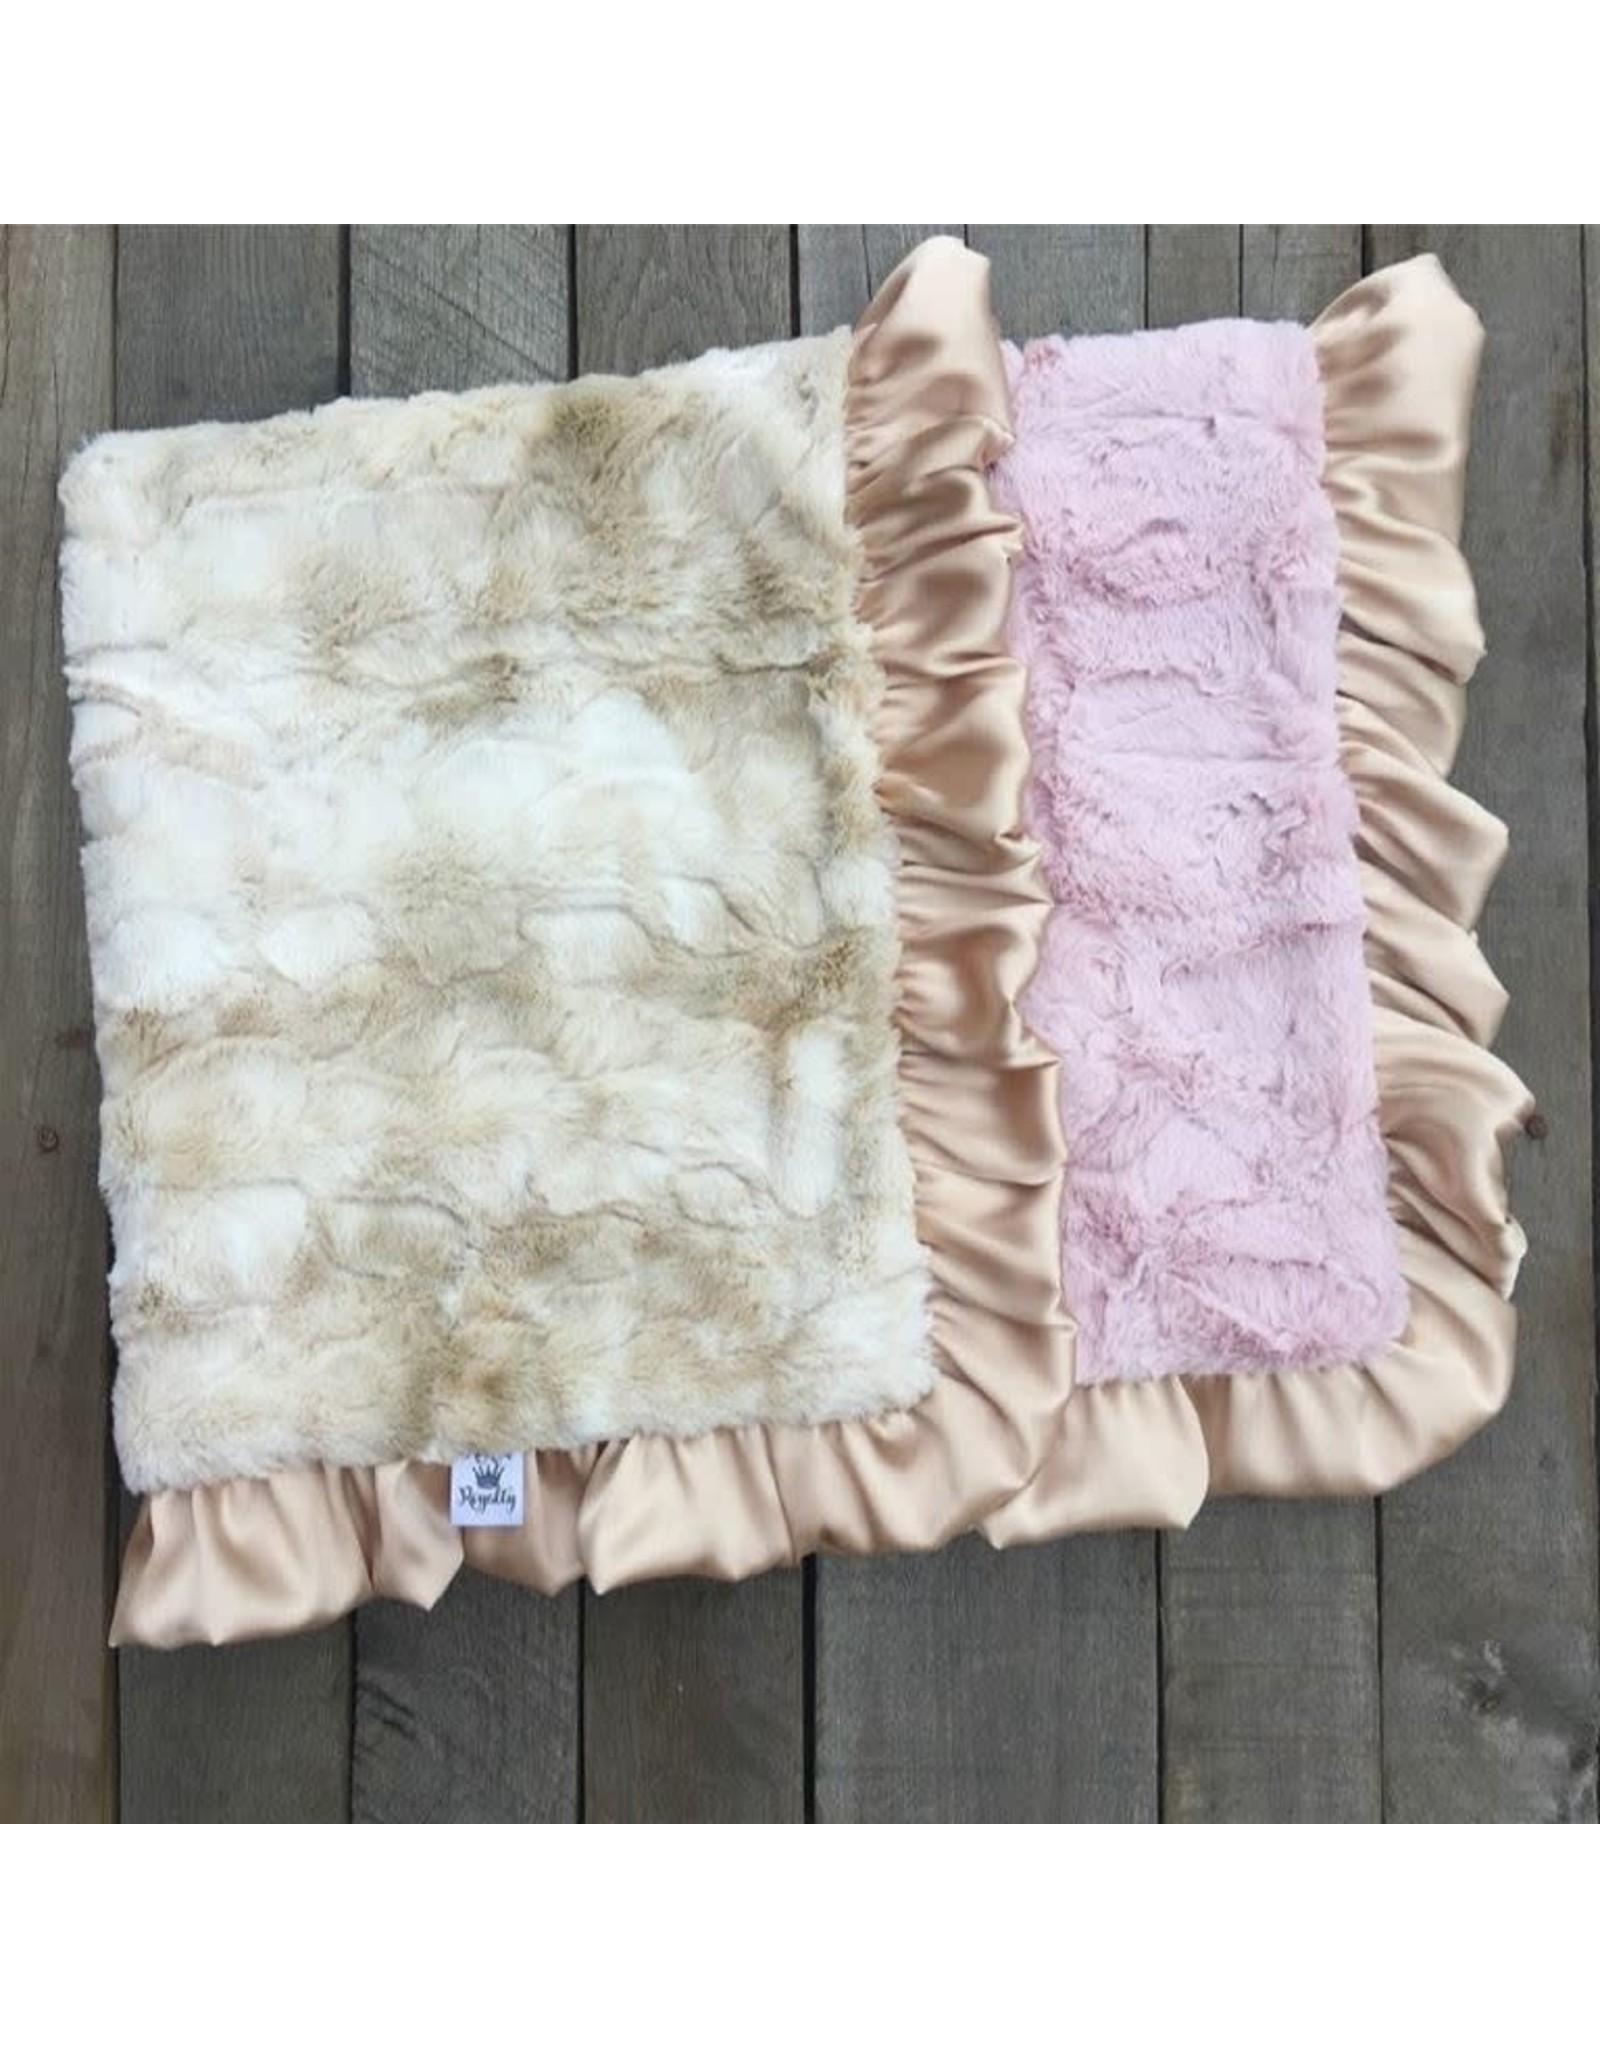 Rockin' Royalty Rockin Royalty- Luxe Rabbit Blush Blanket